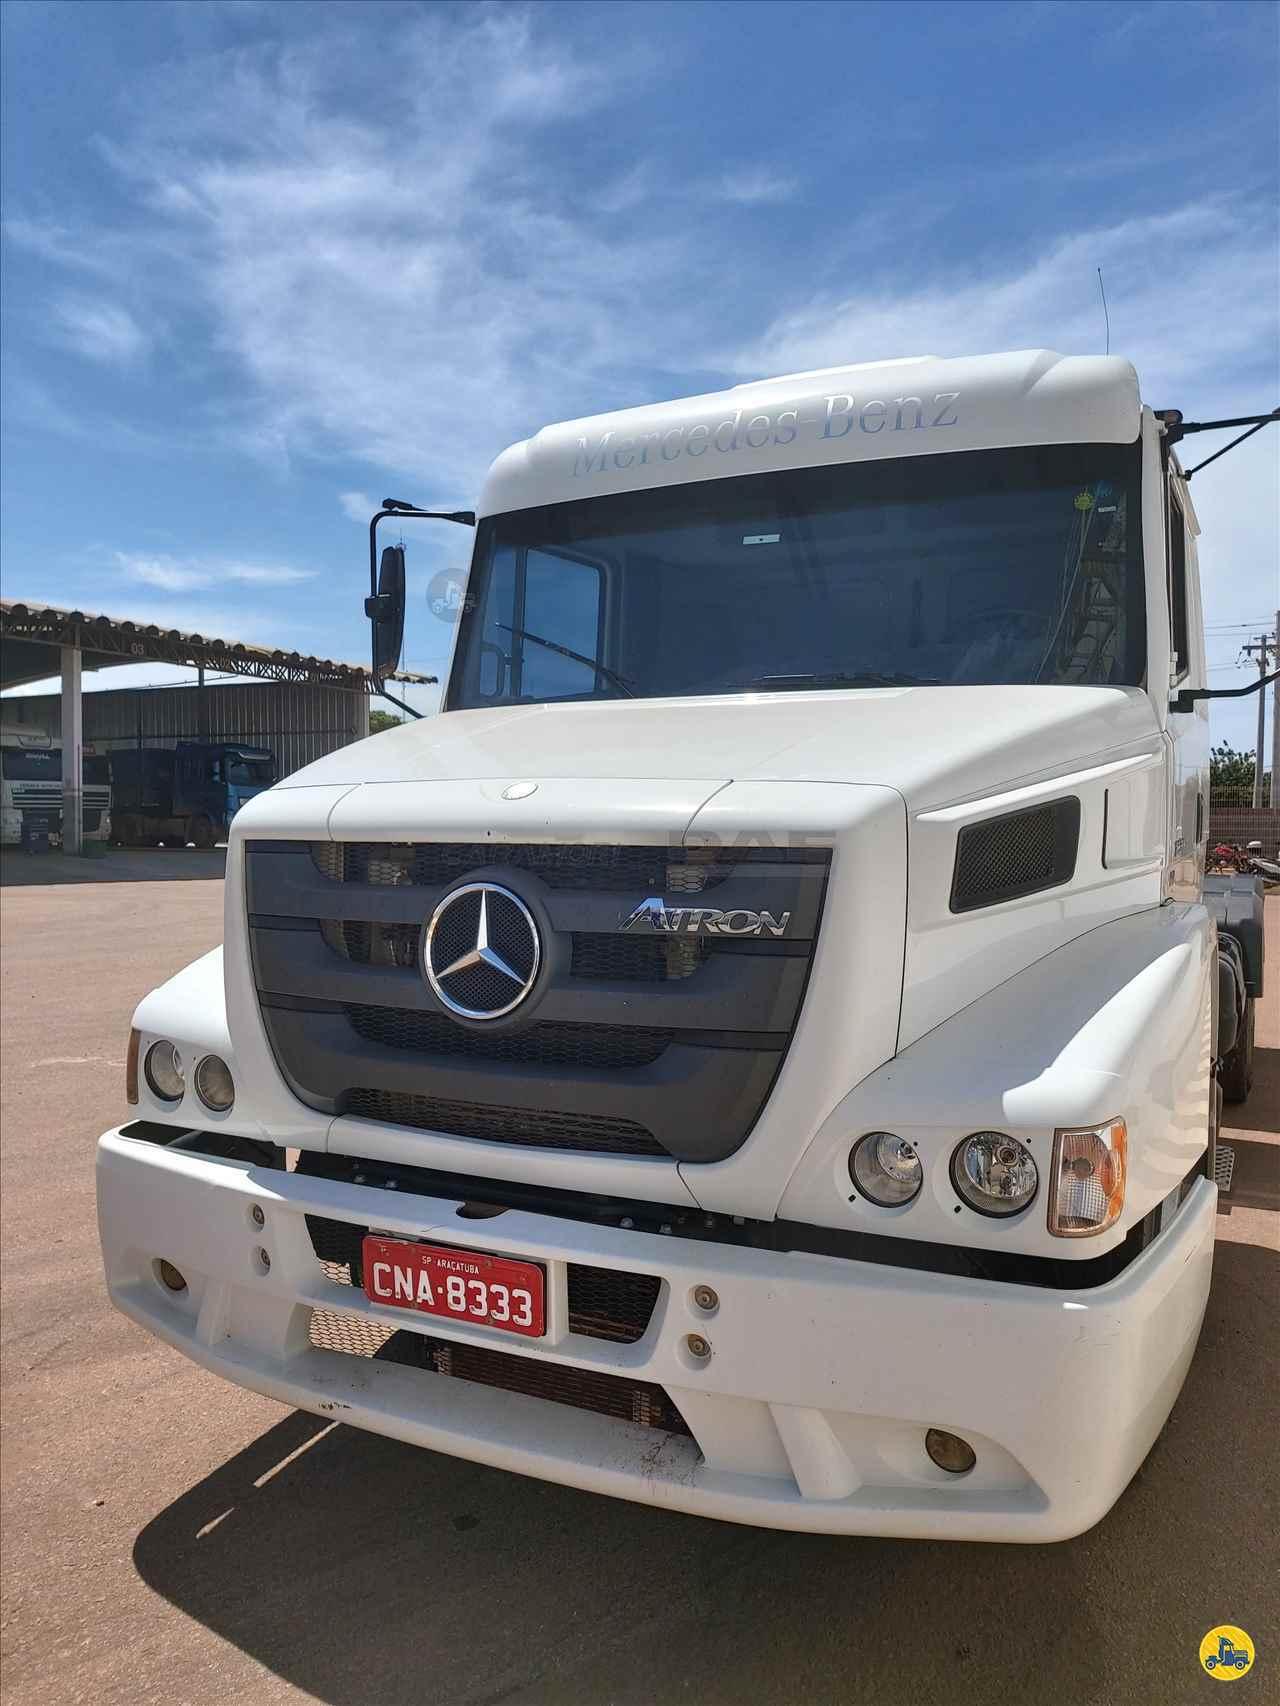 CAMINHAO MERCEDES-BENZ MB 1635 Cavalo Mecânico Truck 6x2 DAF Caramori CUIABA MATO GROSSO MT